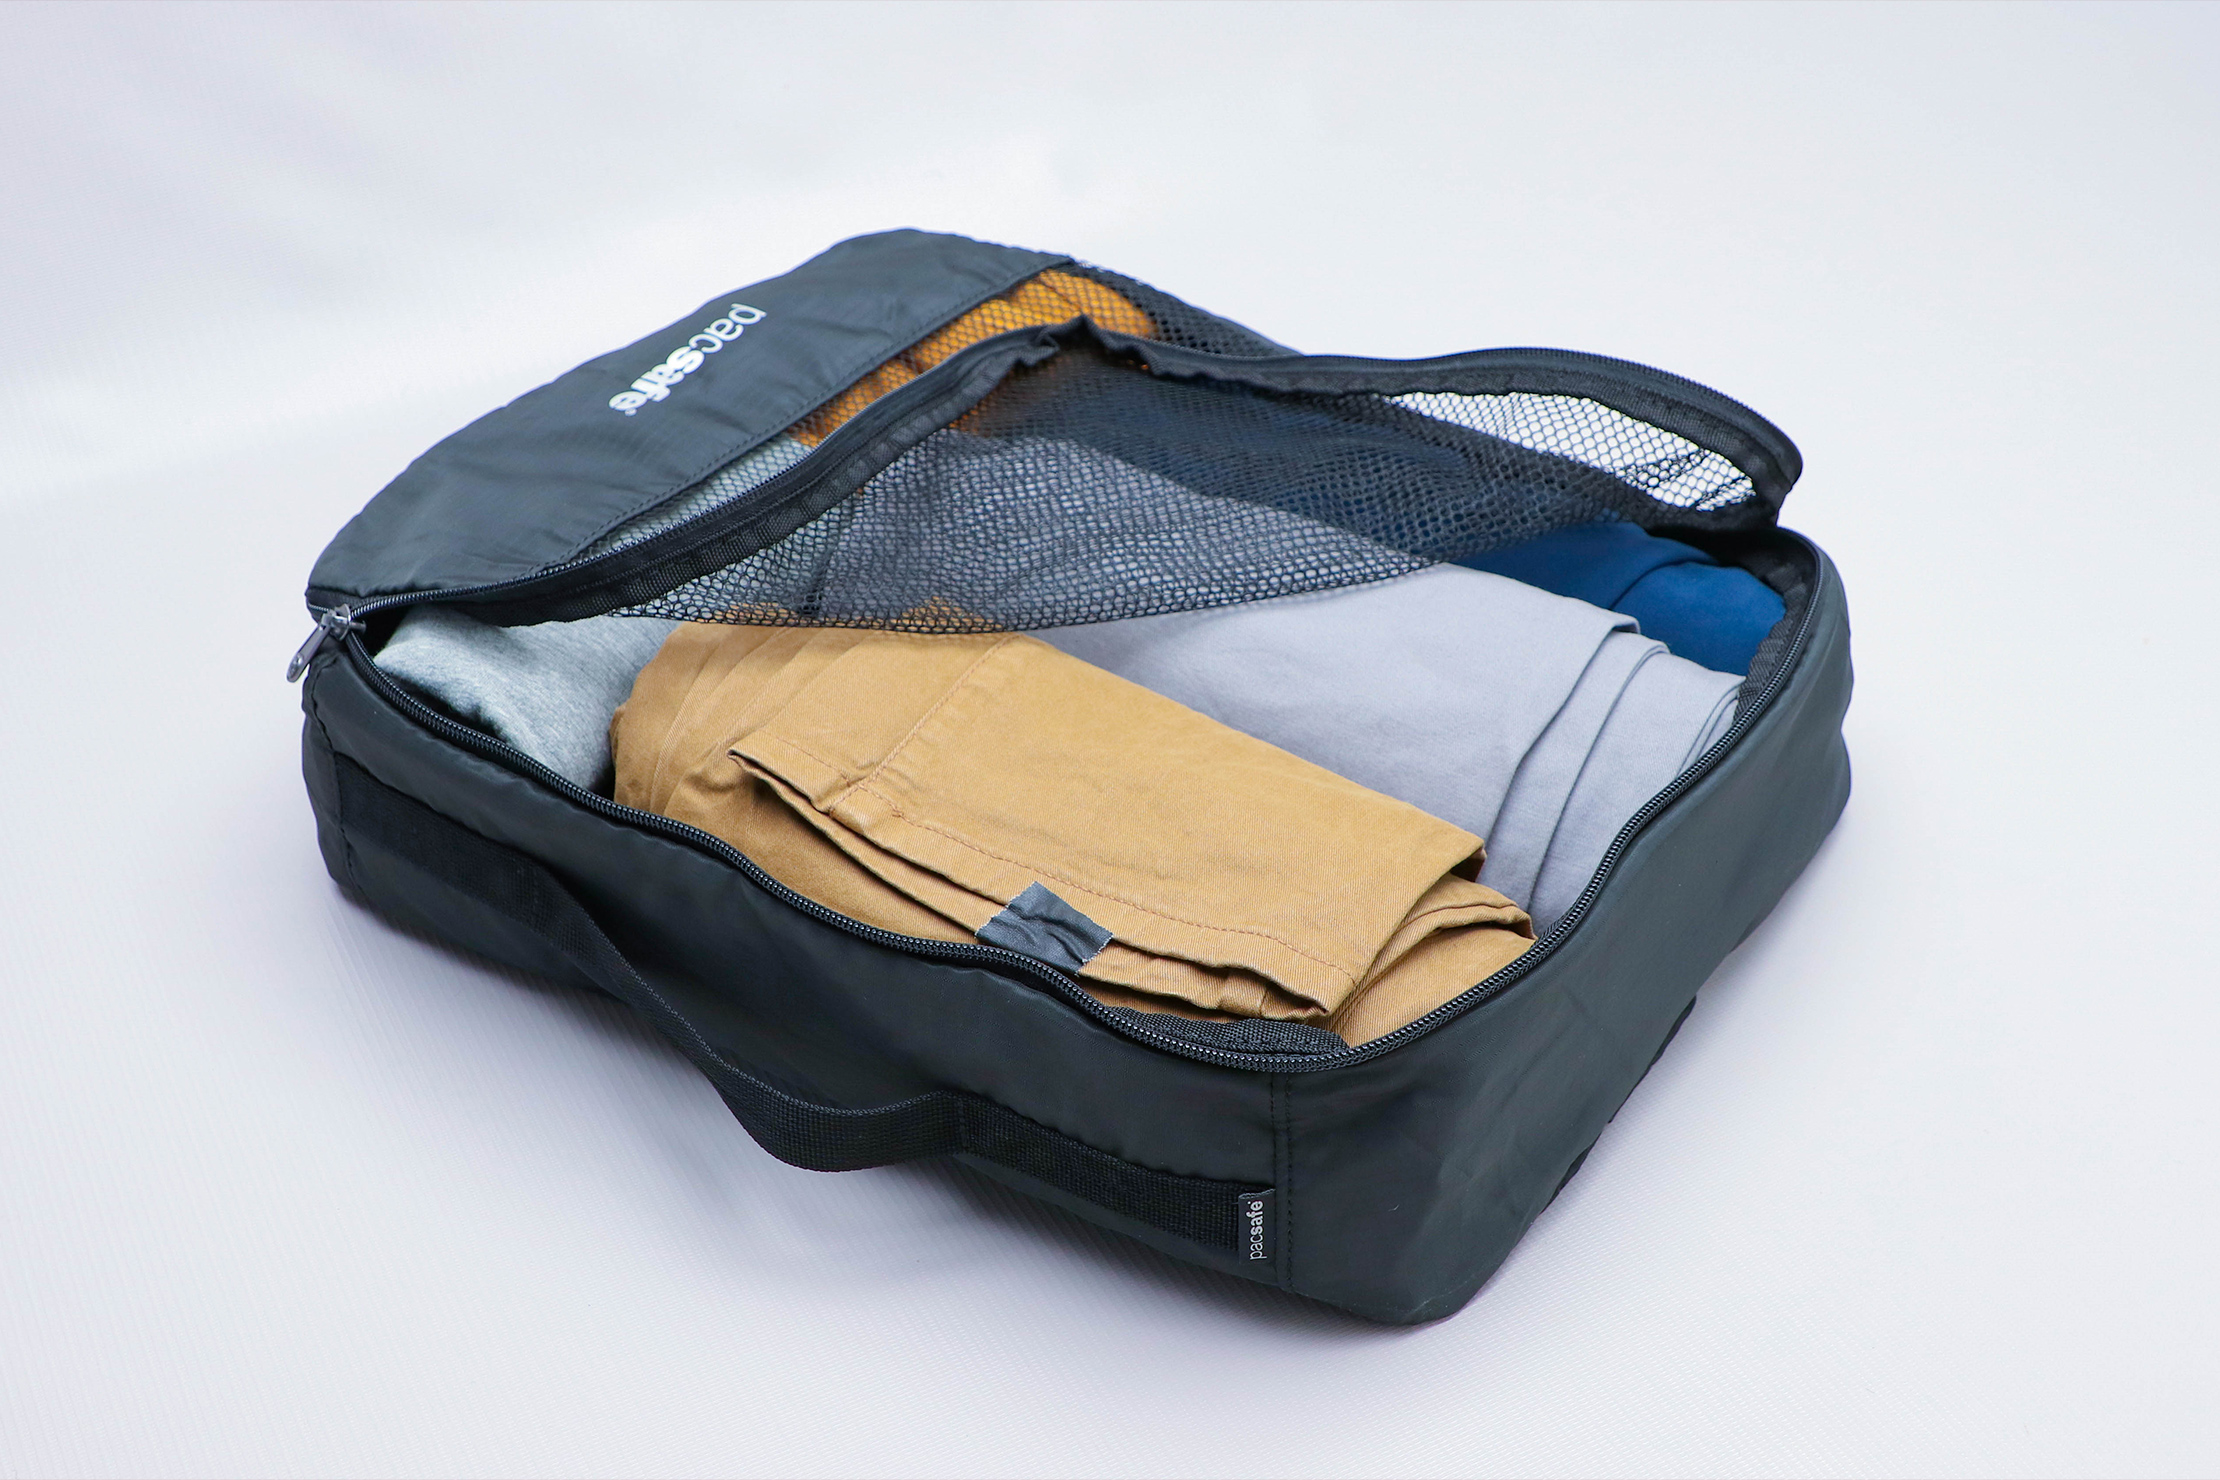 Pacsafe Travel Packing Cubes Large